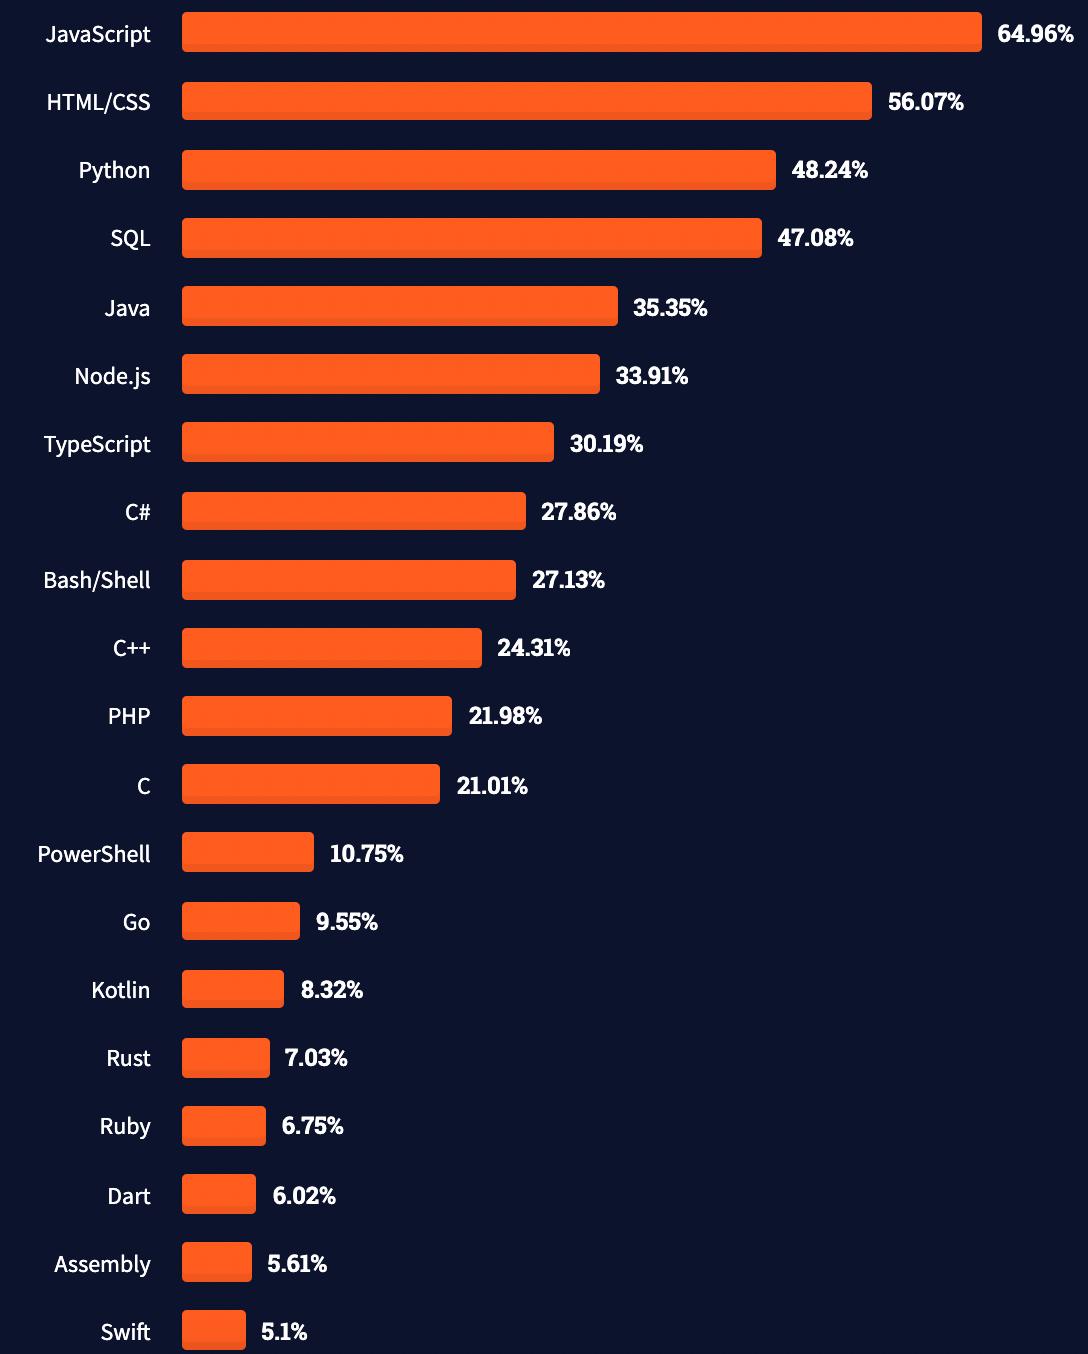 stackoverflow-developer-survey-2021